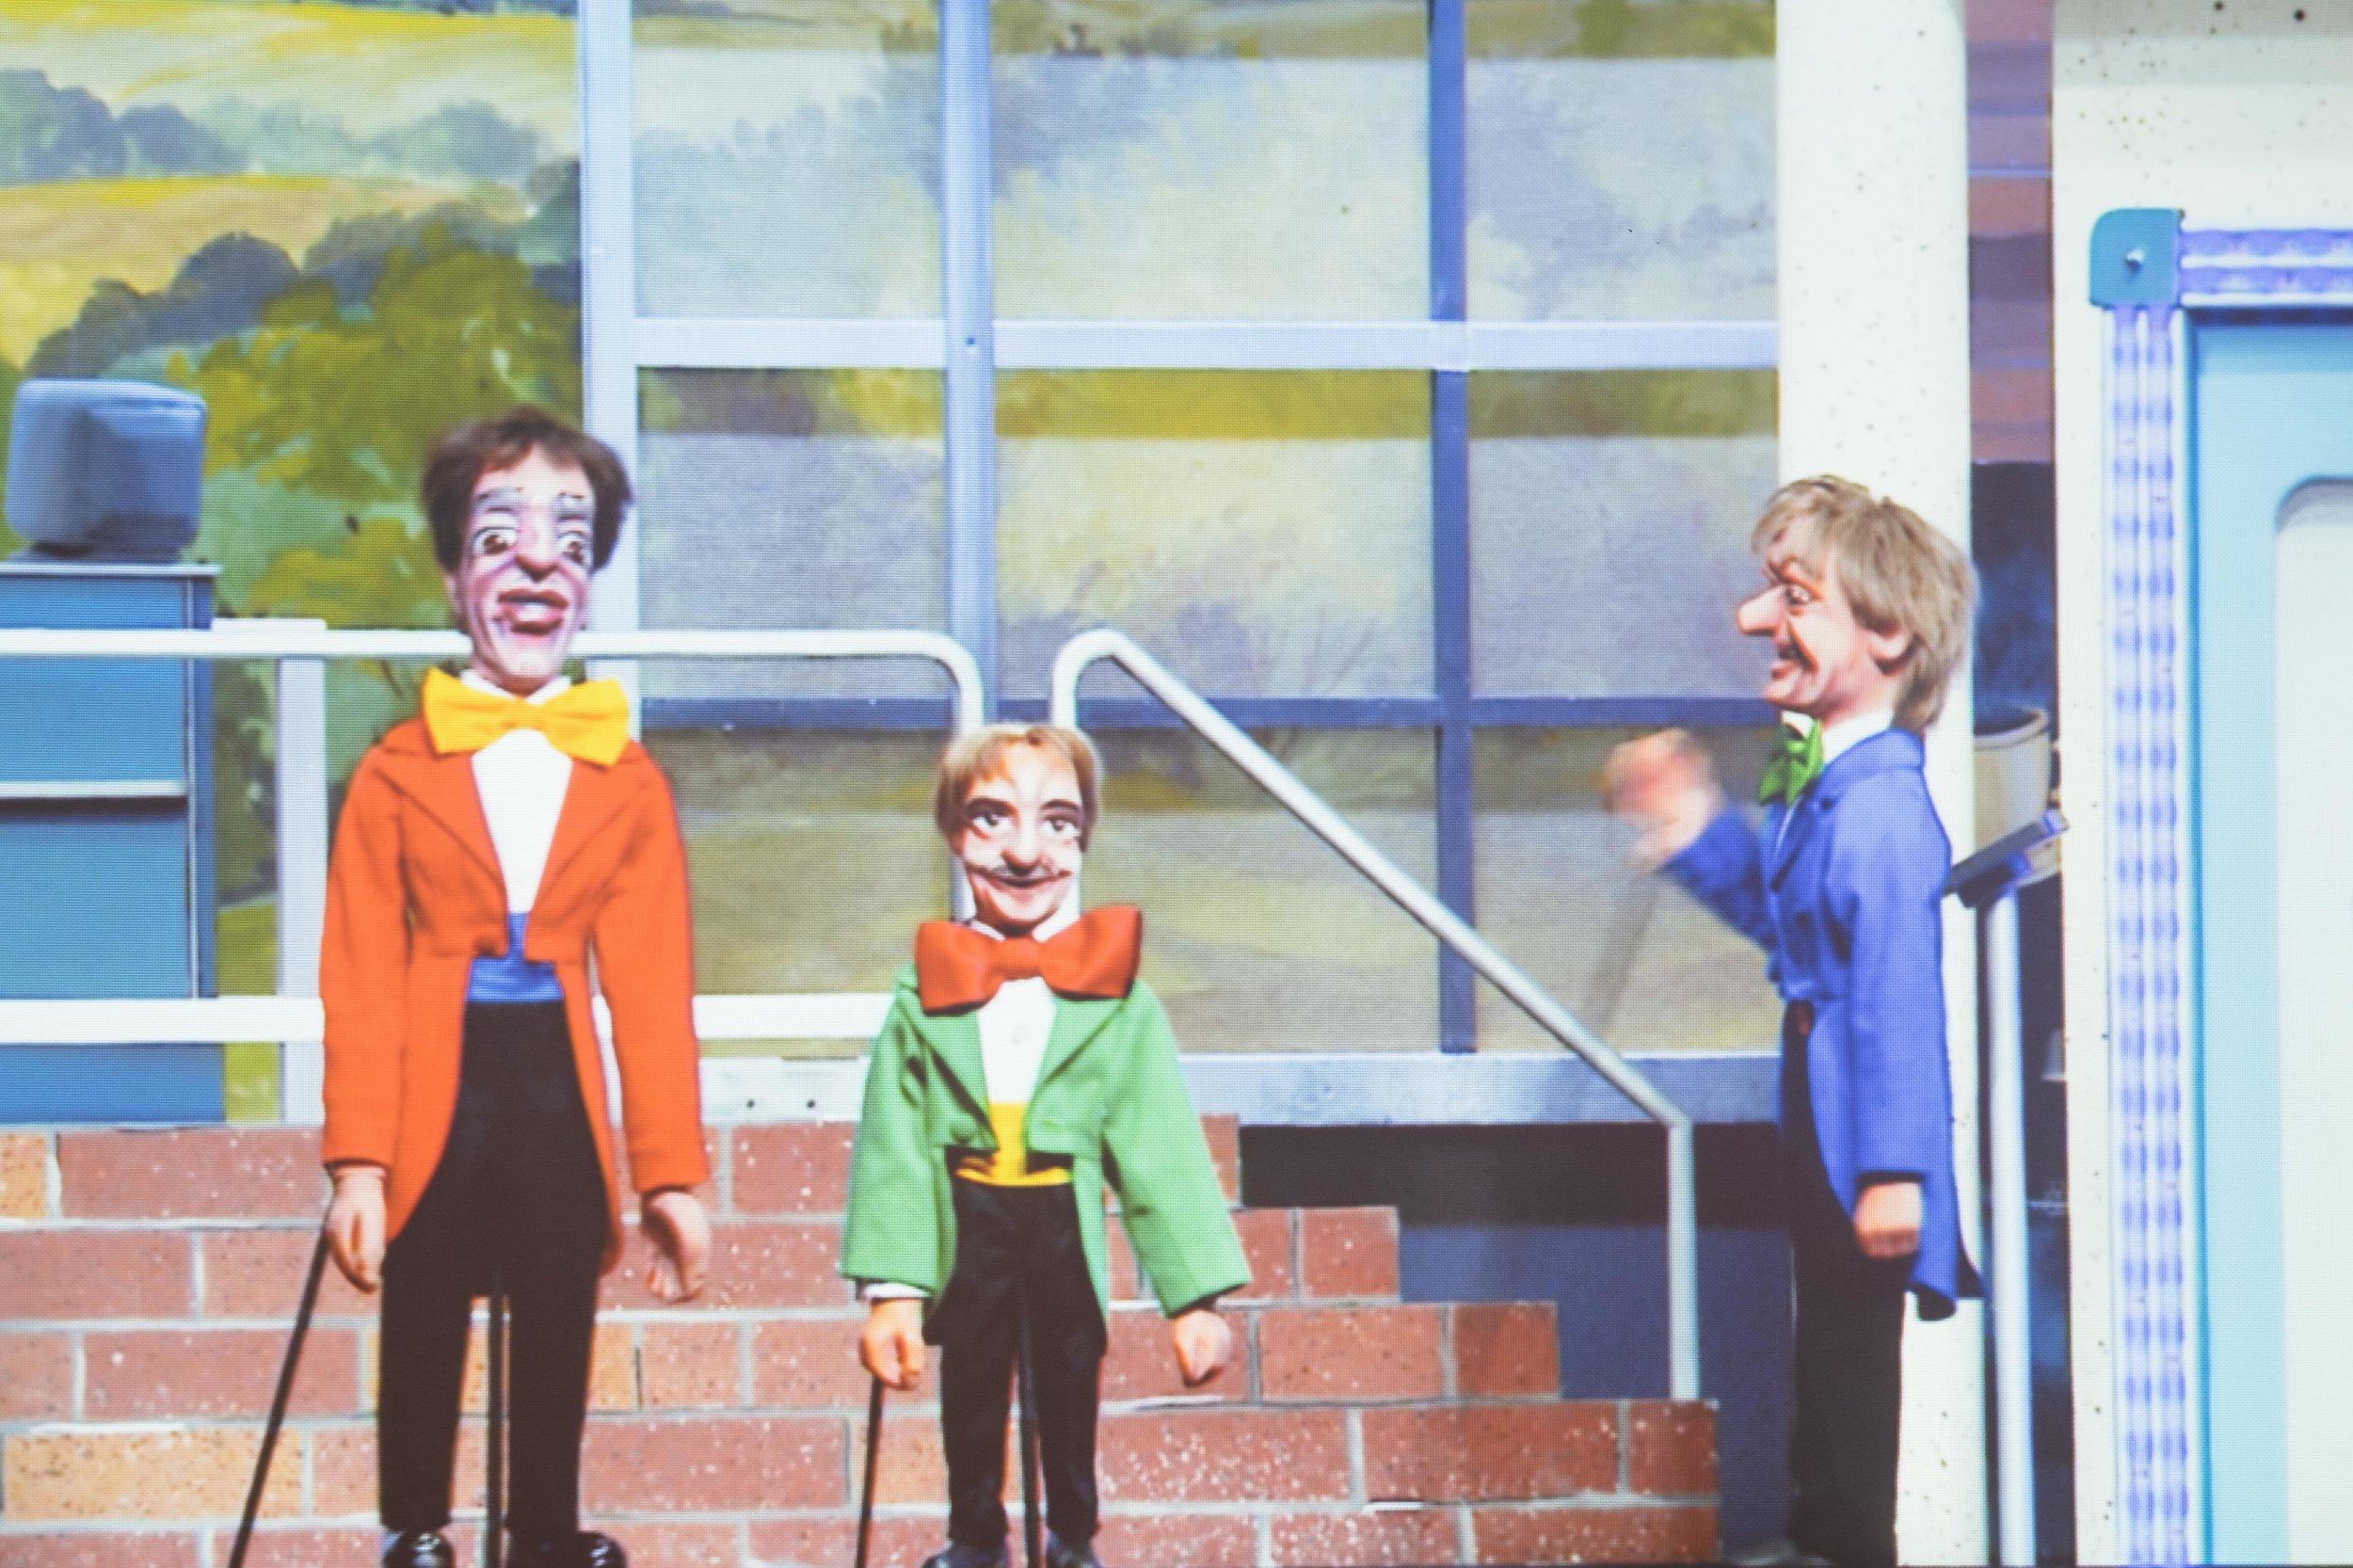 hännesche-puppensitzung-gaffel-karneval-koeln-wearecity-atheneadiapoulis-29.jpg